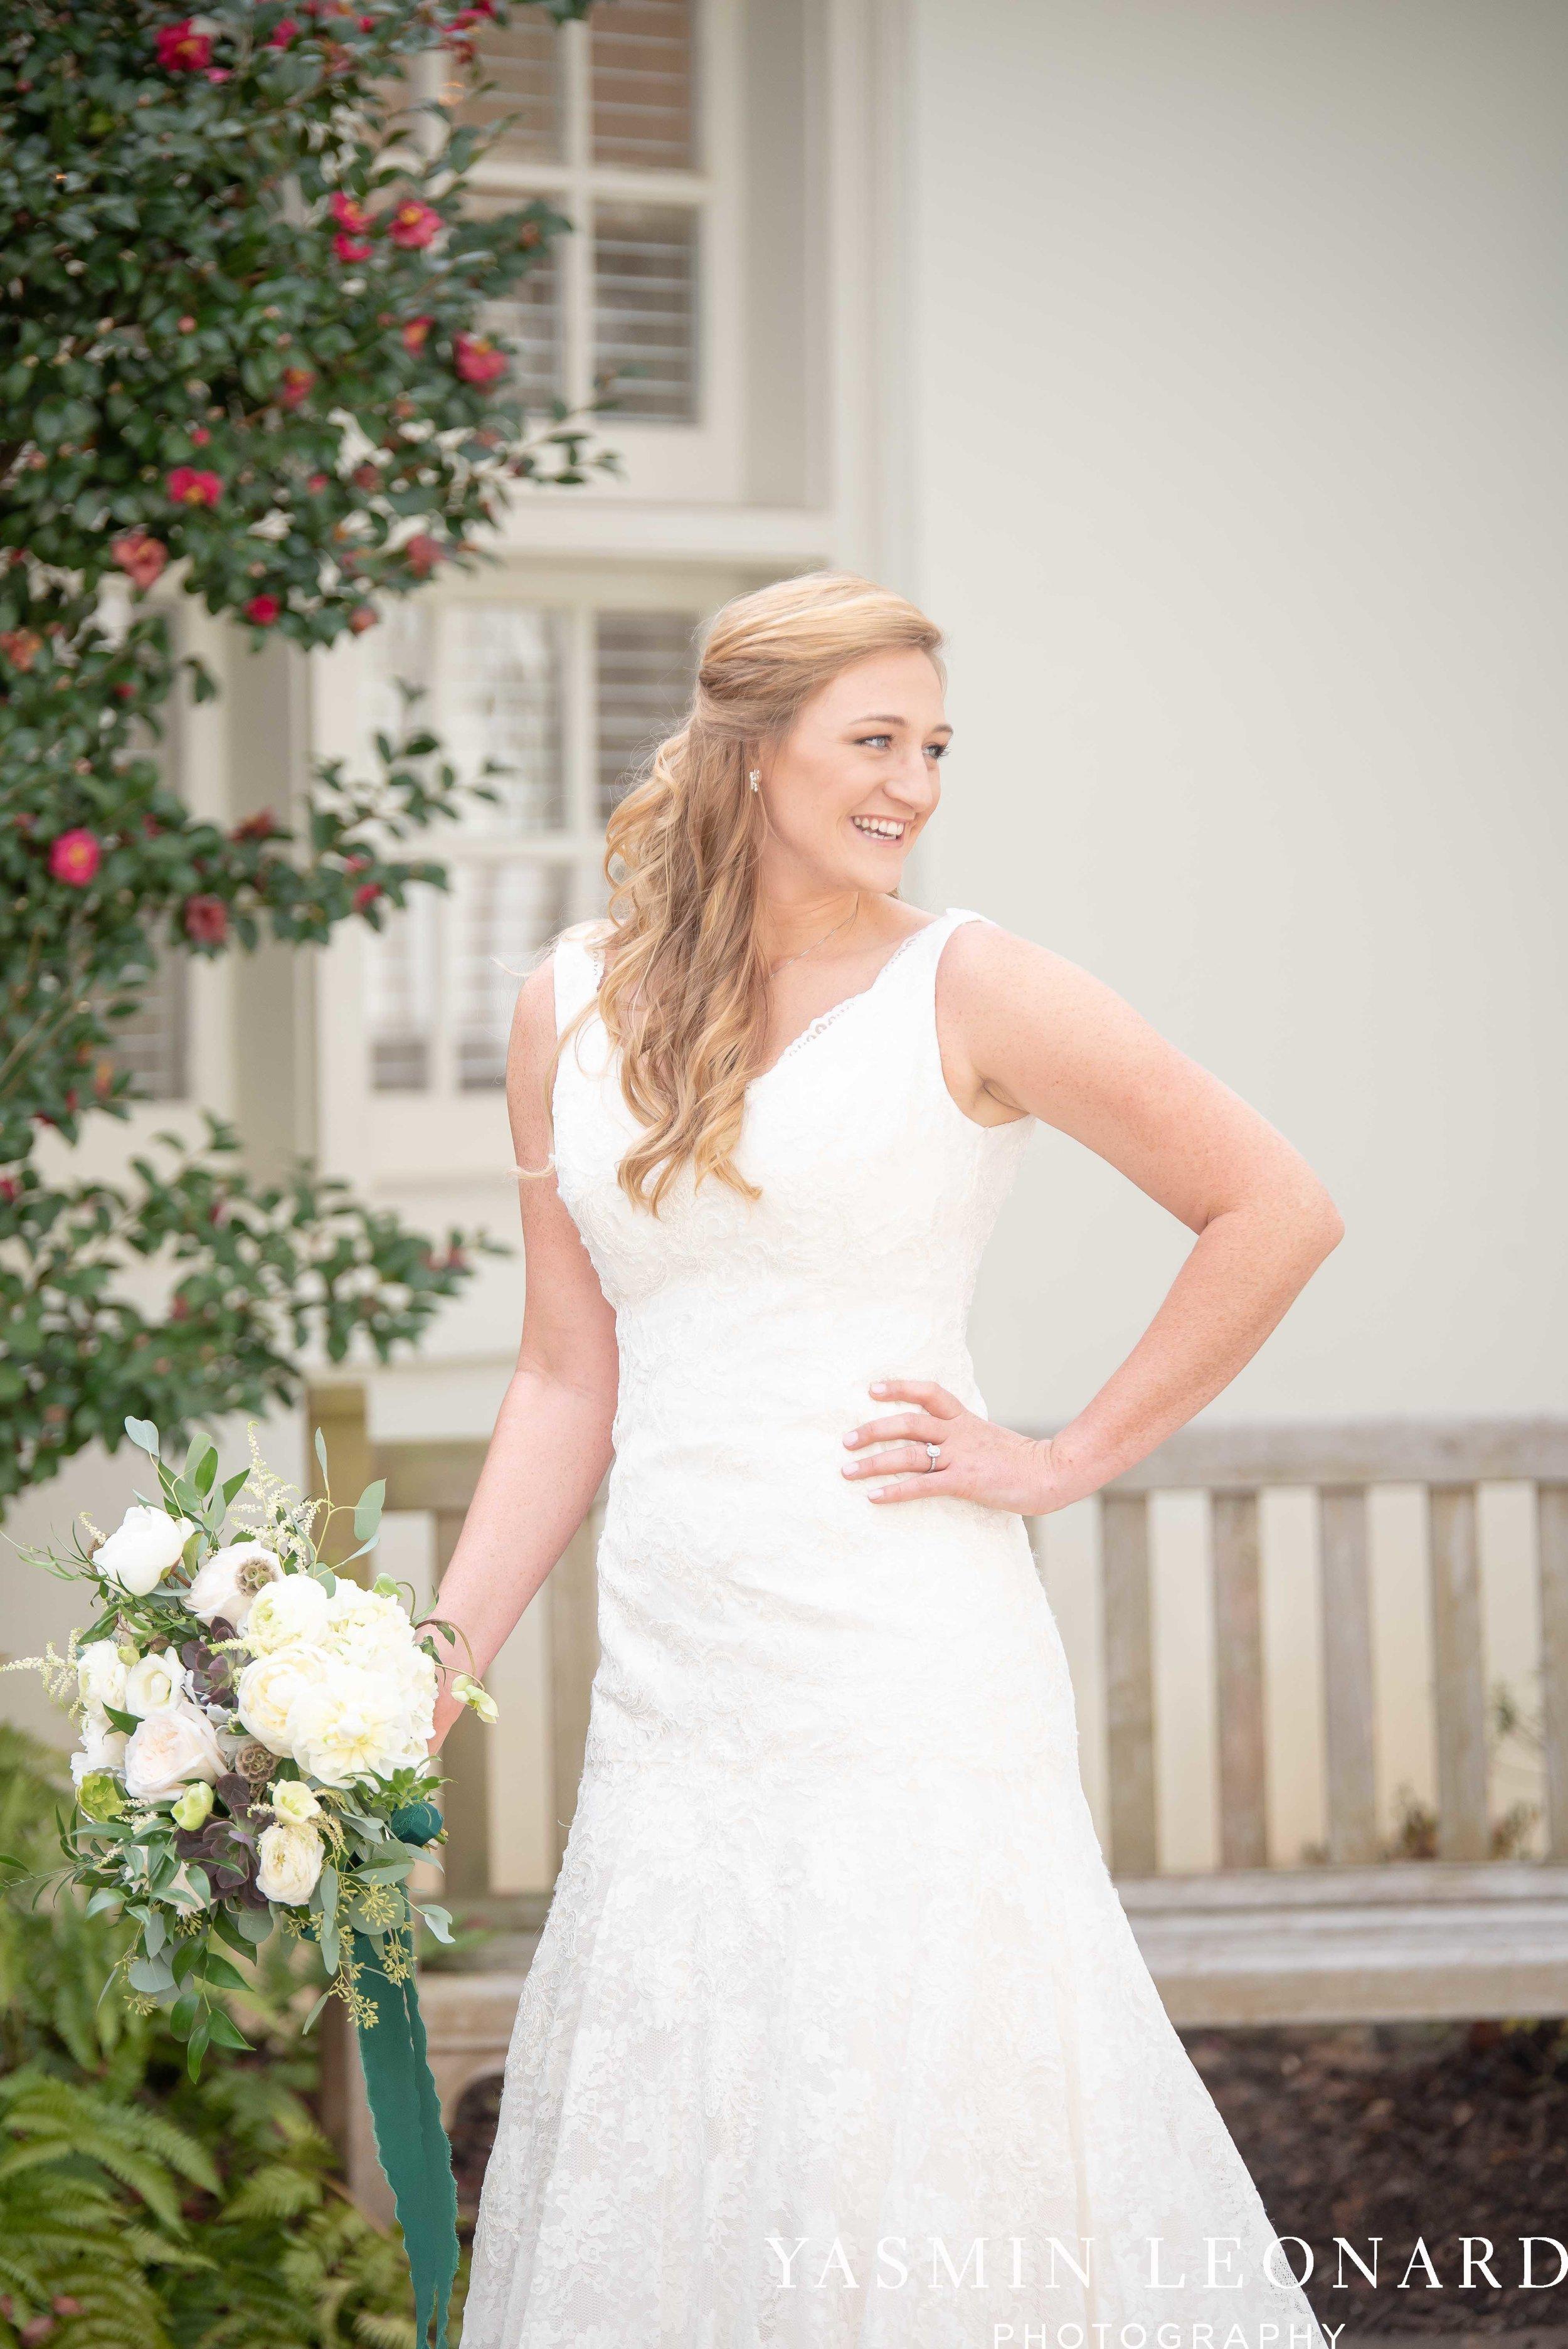 Barn at Reynolda Village - Winston Salem Wedding - White and Green Wedding - NC Wedding - NC Barns - Yasmin Leonard Photography-16.jpg